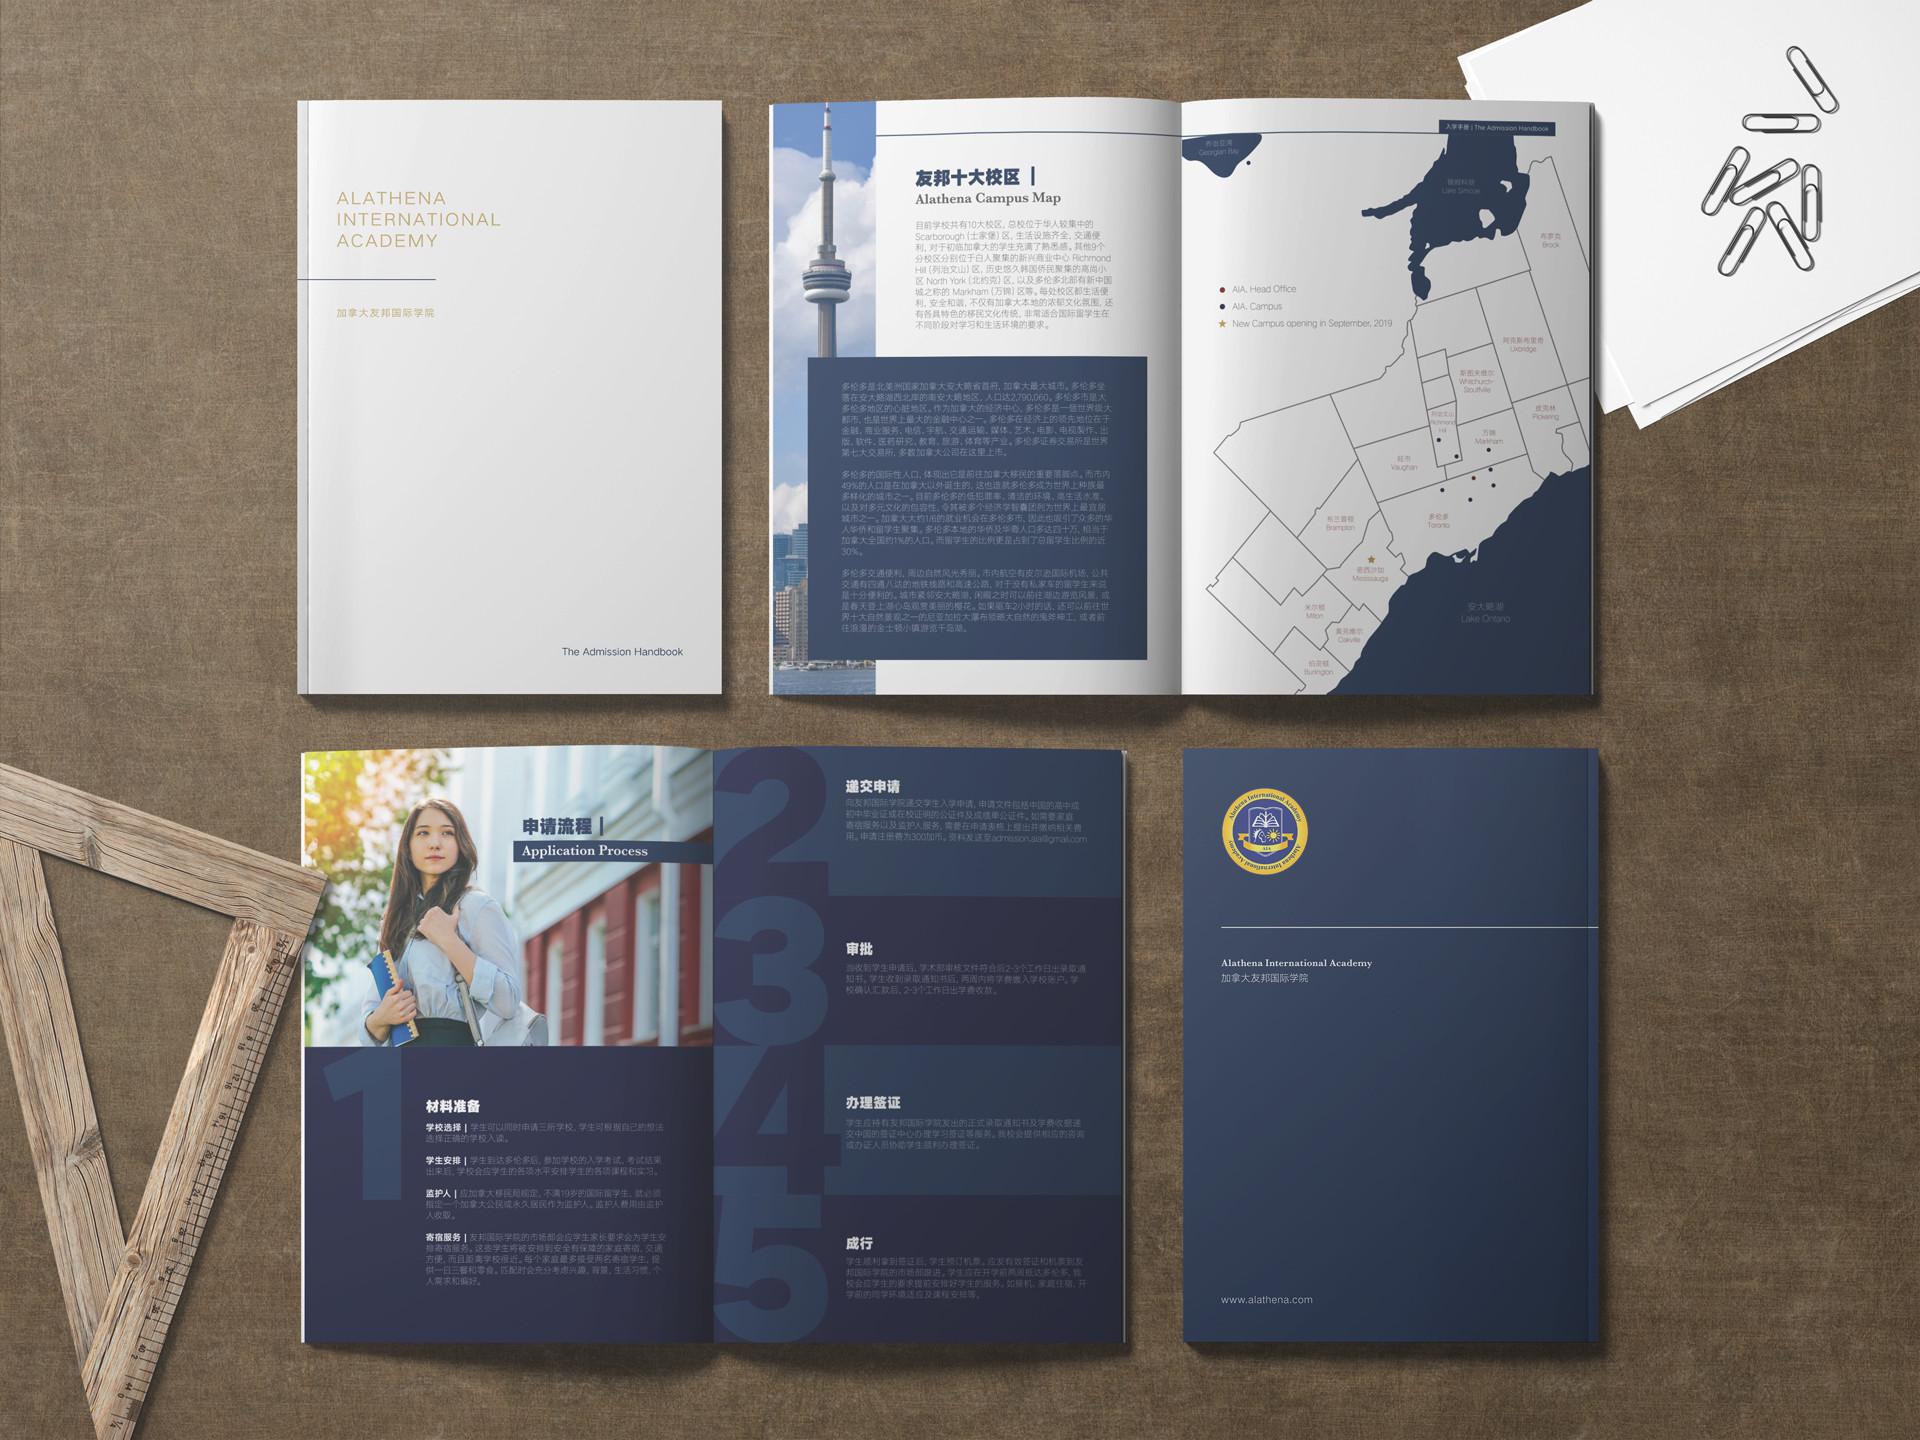 Alathena-International-Academy_Handbook-